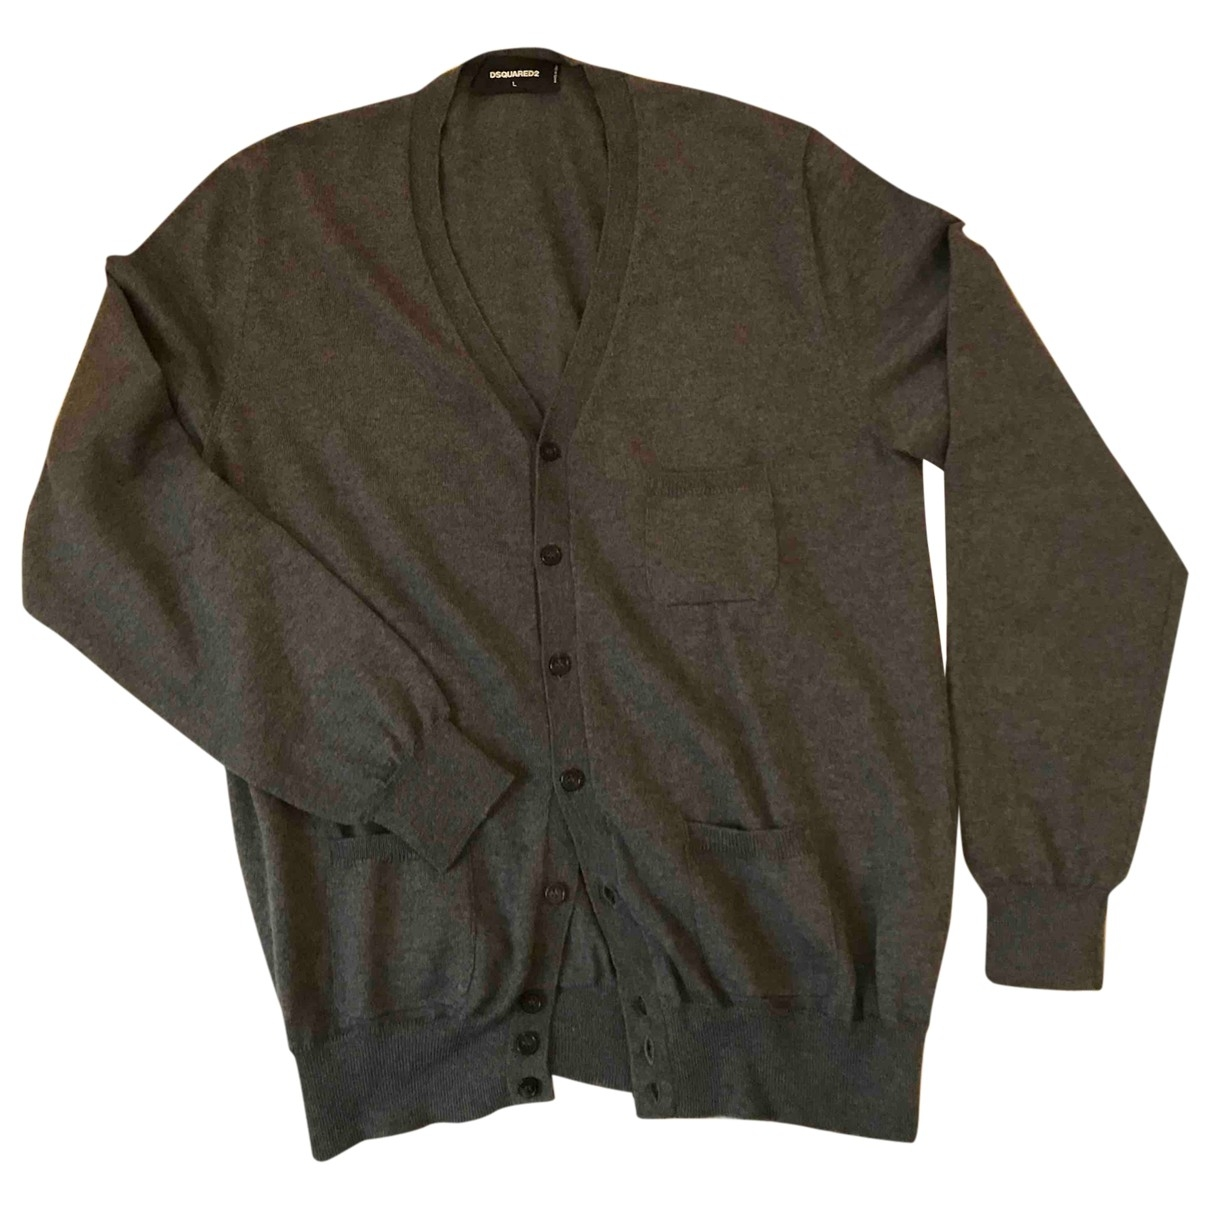 Dsquared2 \N Anthracite Wool Knitwear & Sweatshirts for Men L International